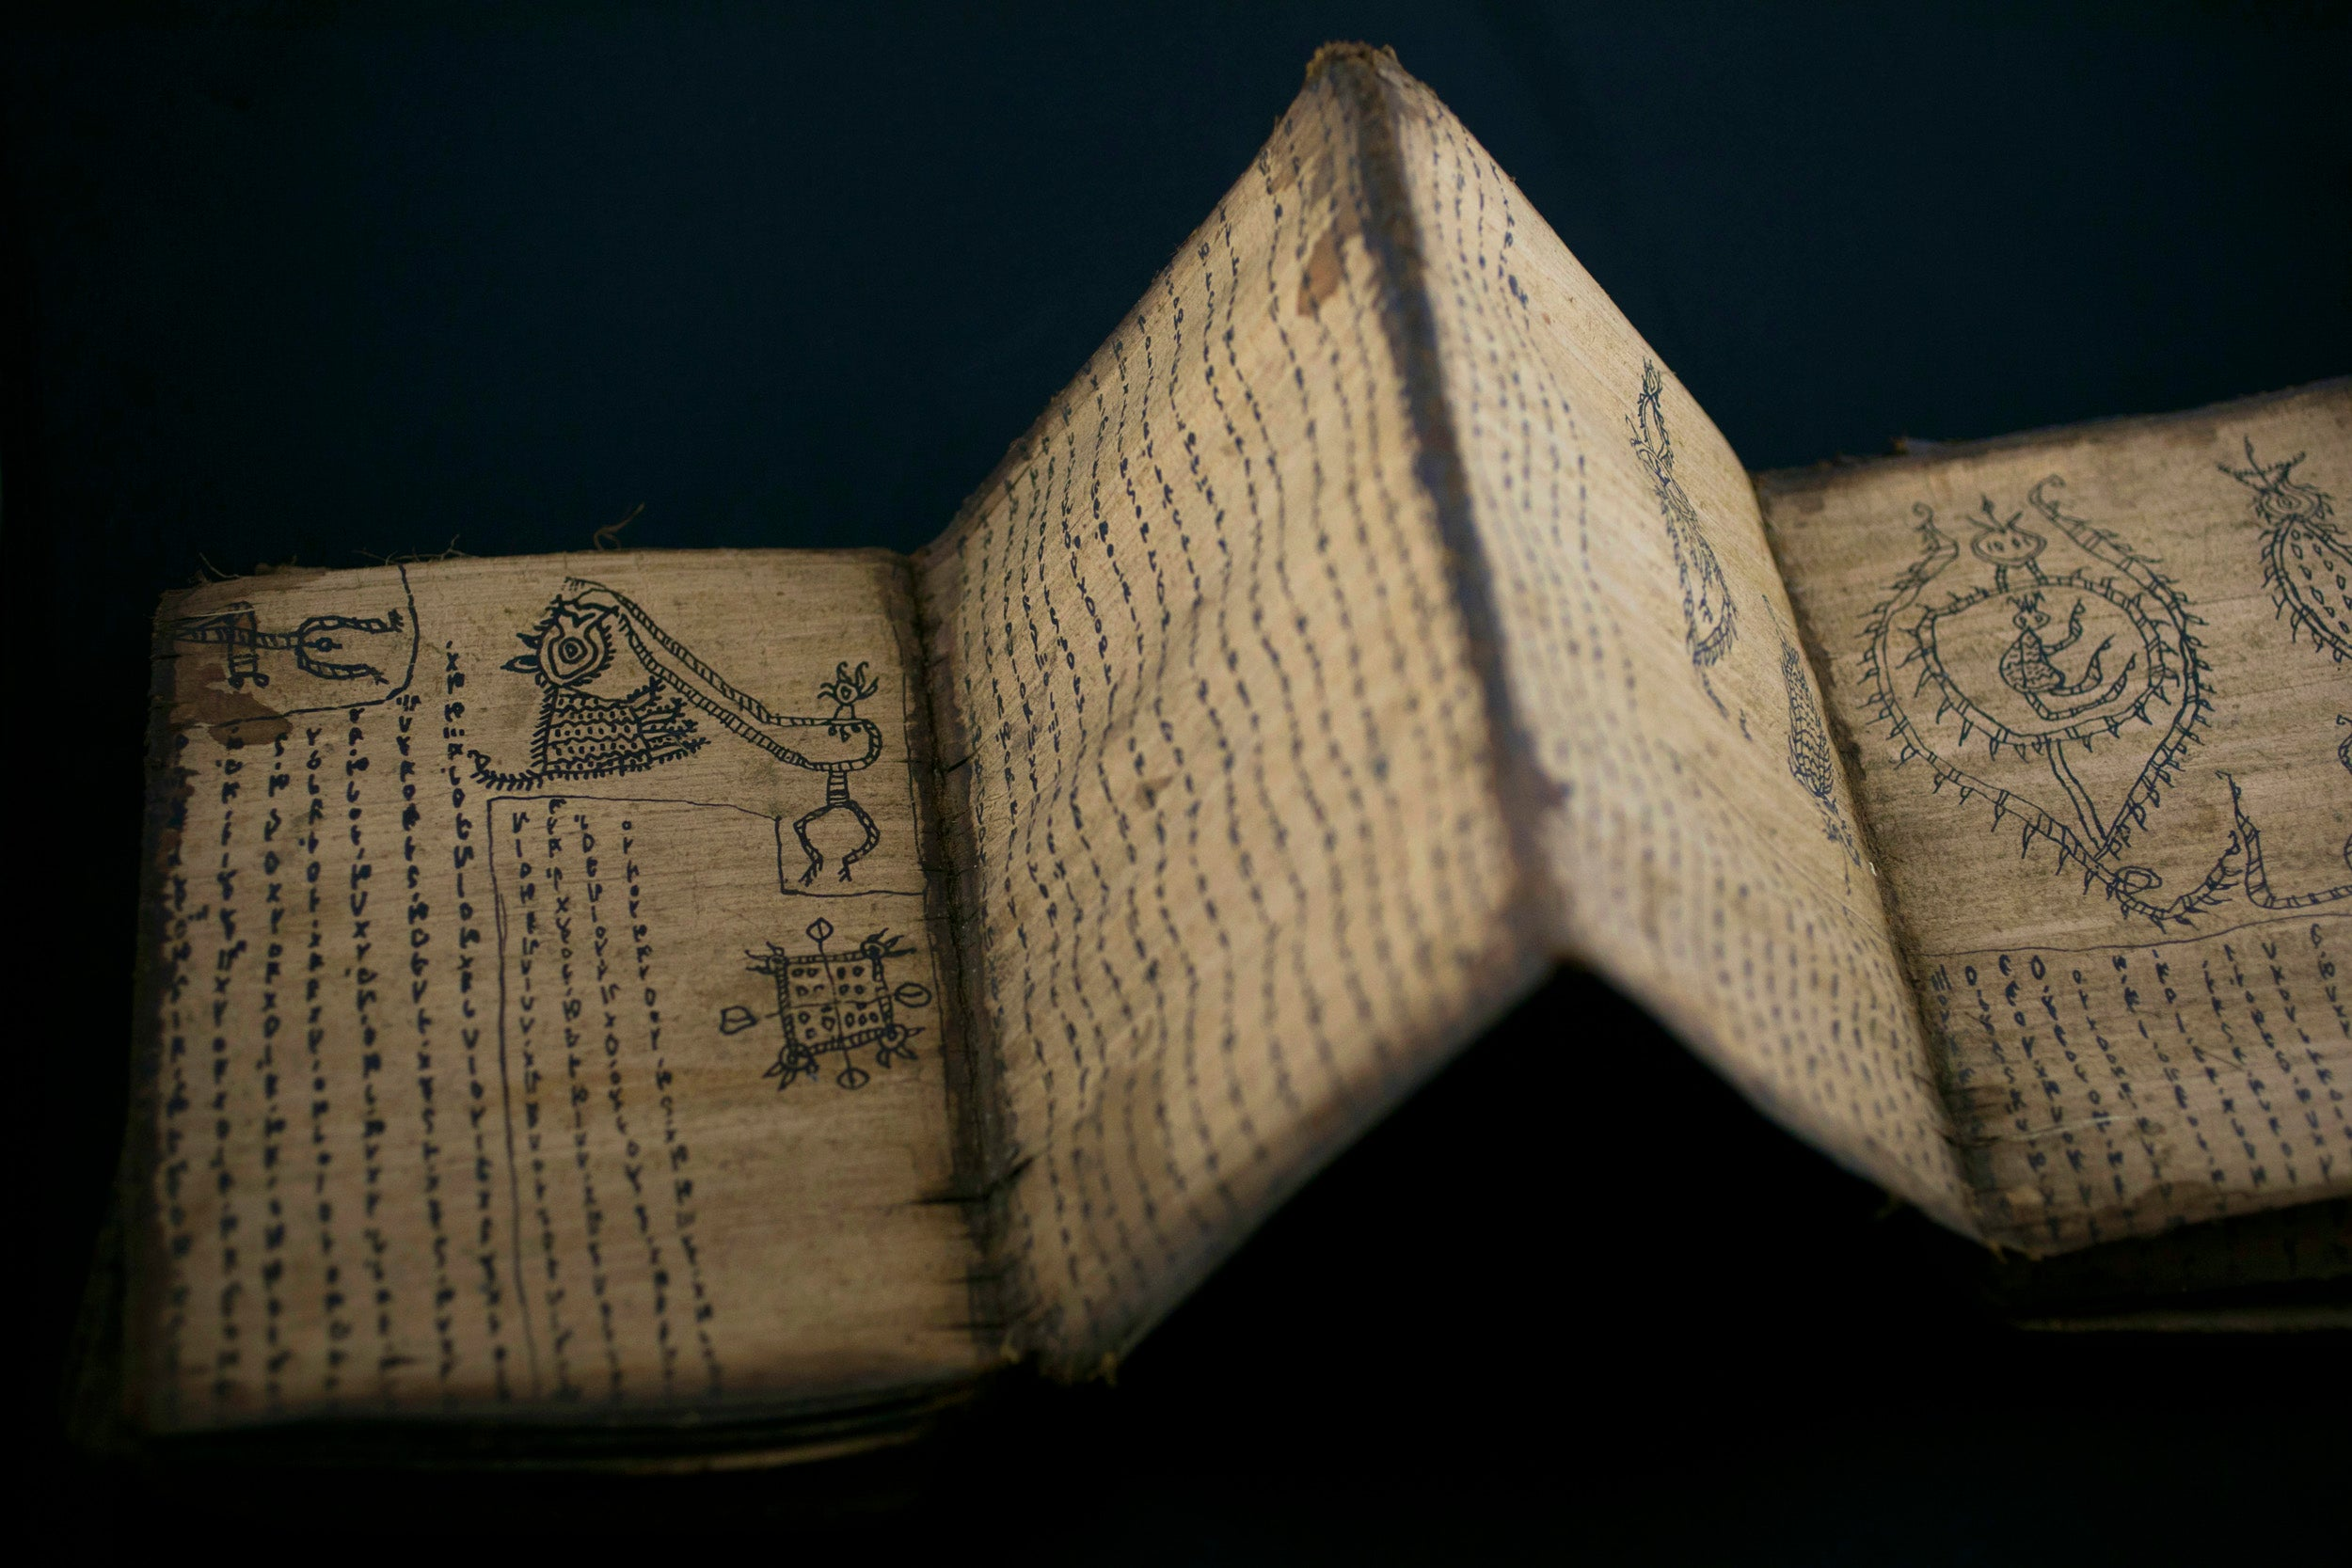 Batak accordion book of spells.